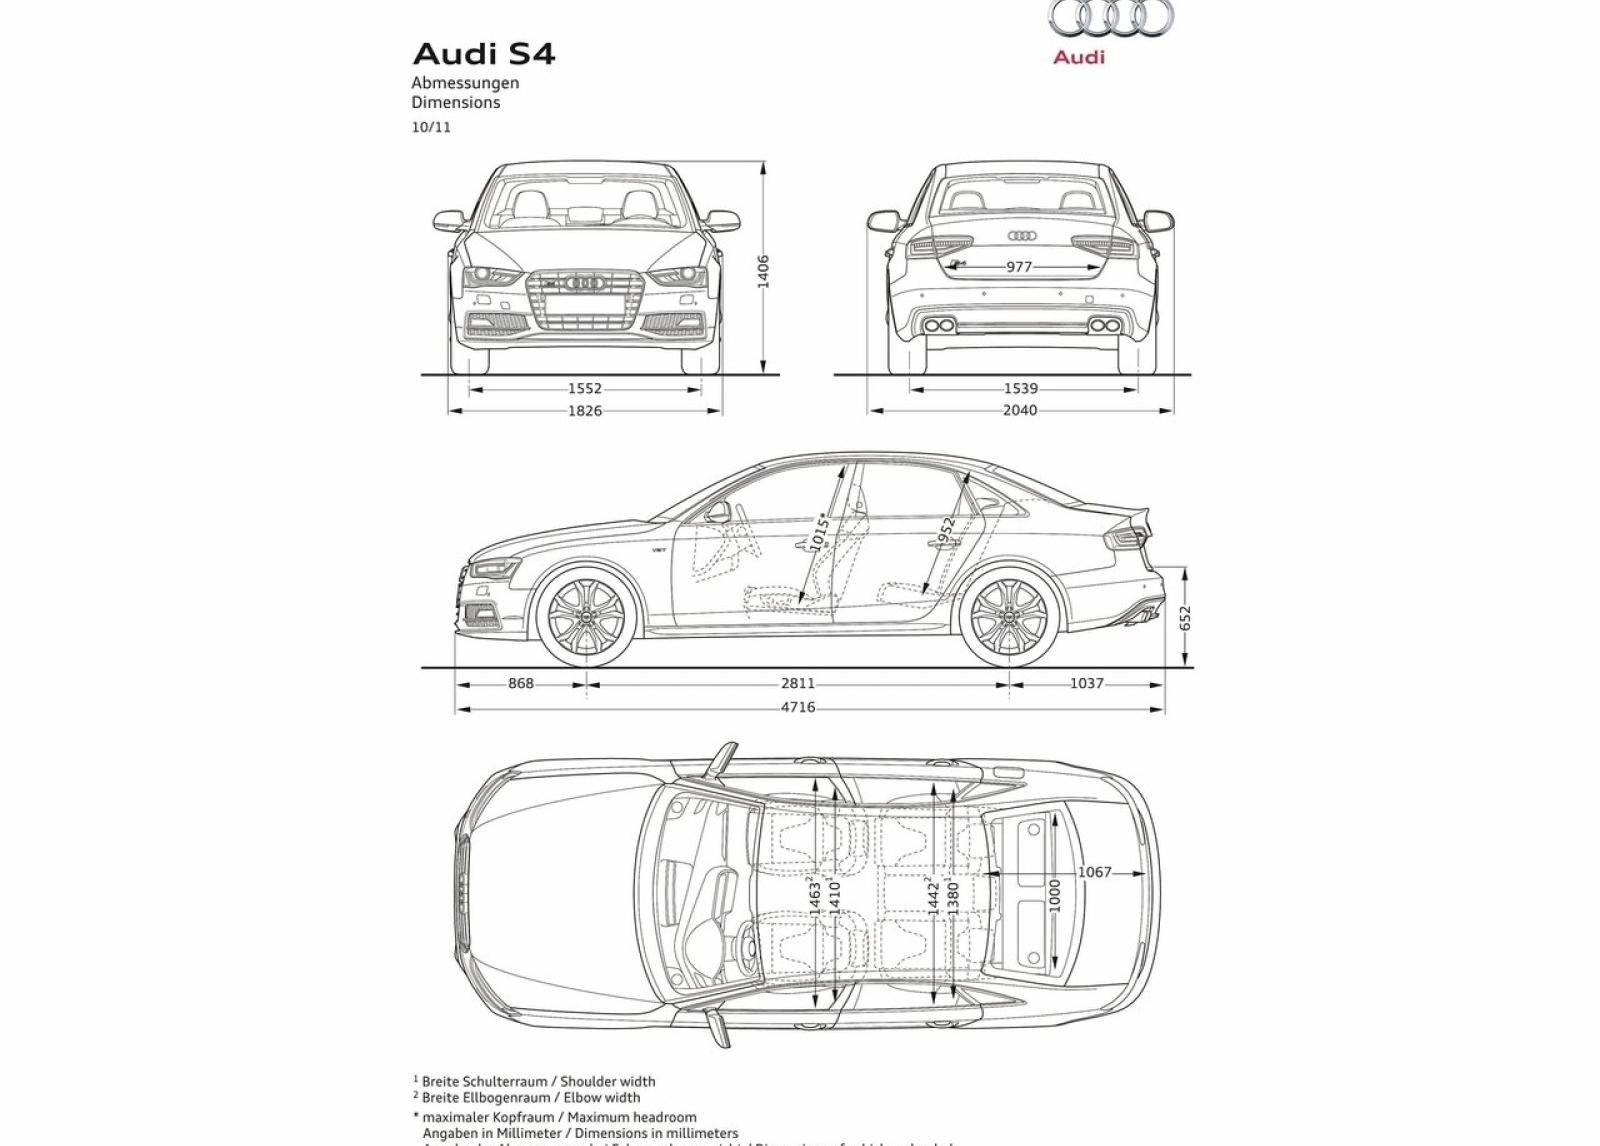 Audi S4 Hd Wallpapers